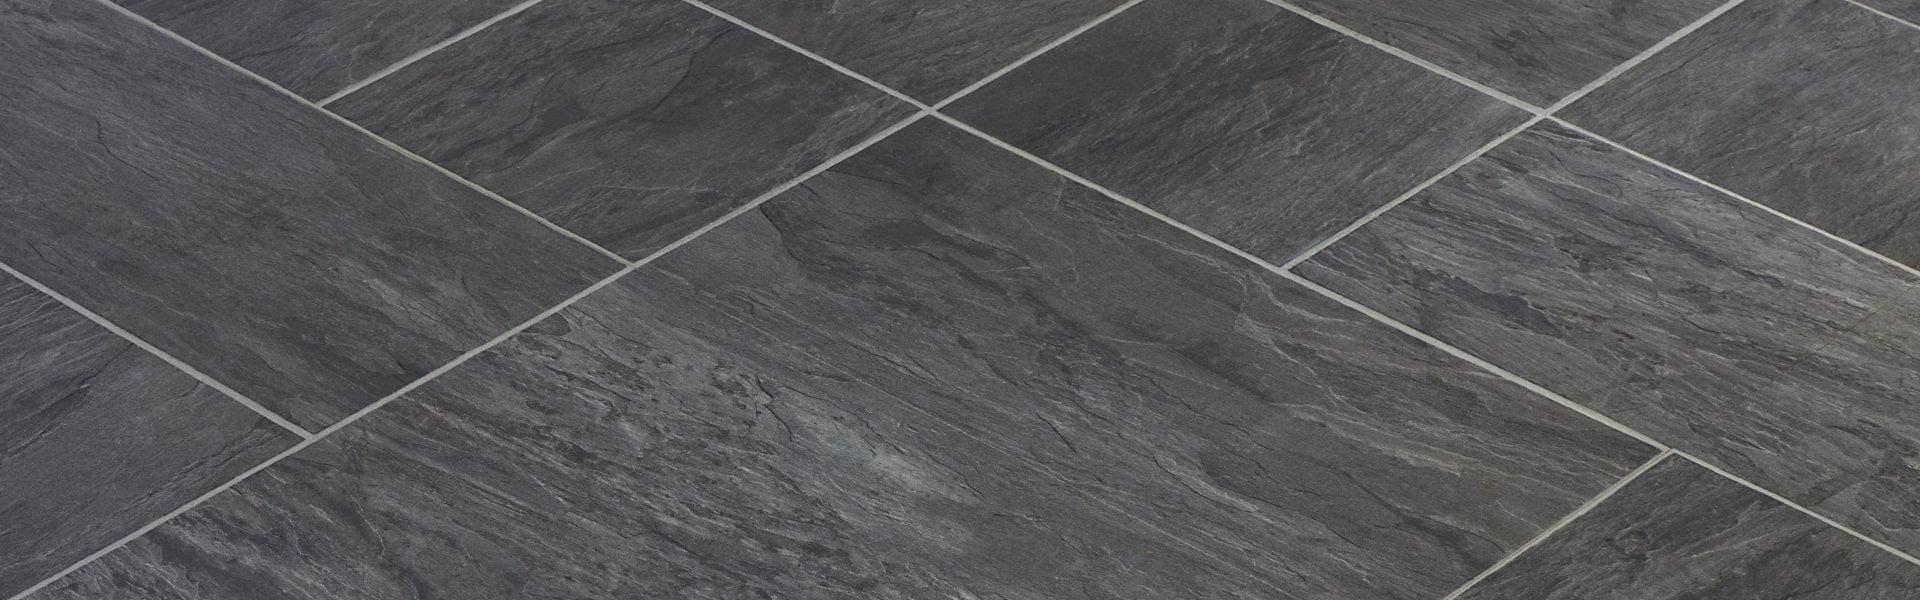 Top 28 vinyl plank flooring high quality vinyl plank for High quality vinyl flooring